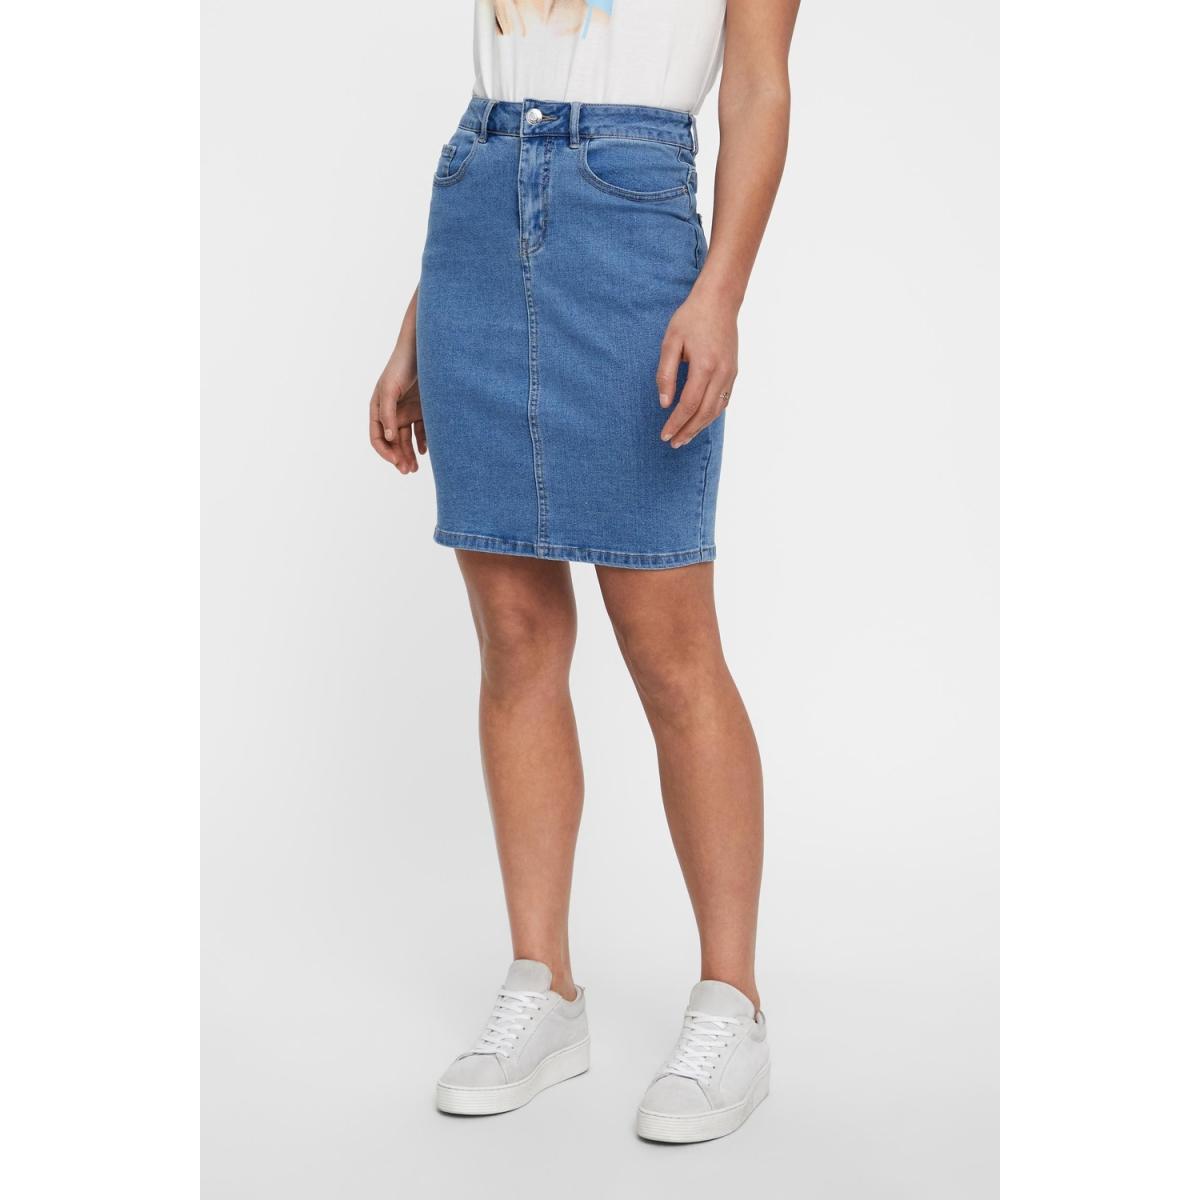 vmhot nine hw dnm pencil skirt mix noos 10193076 vero moda rok light blue denim